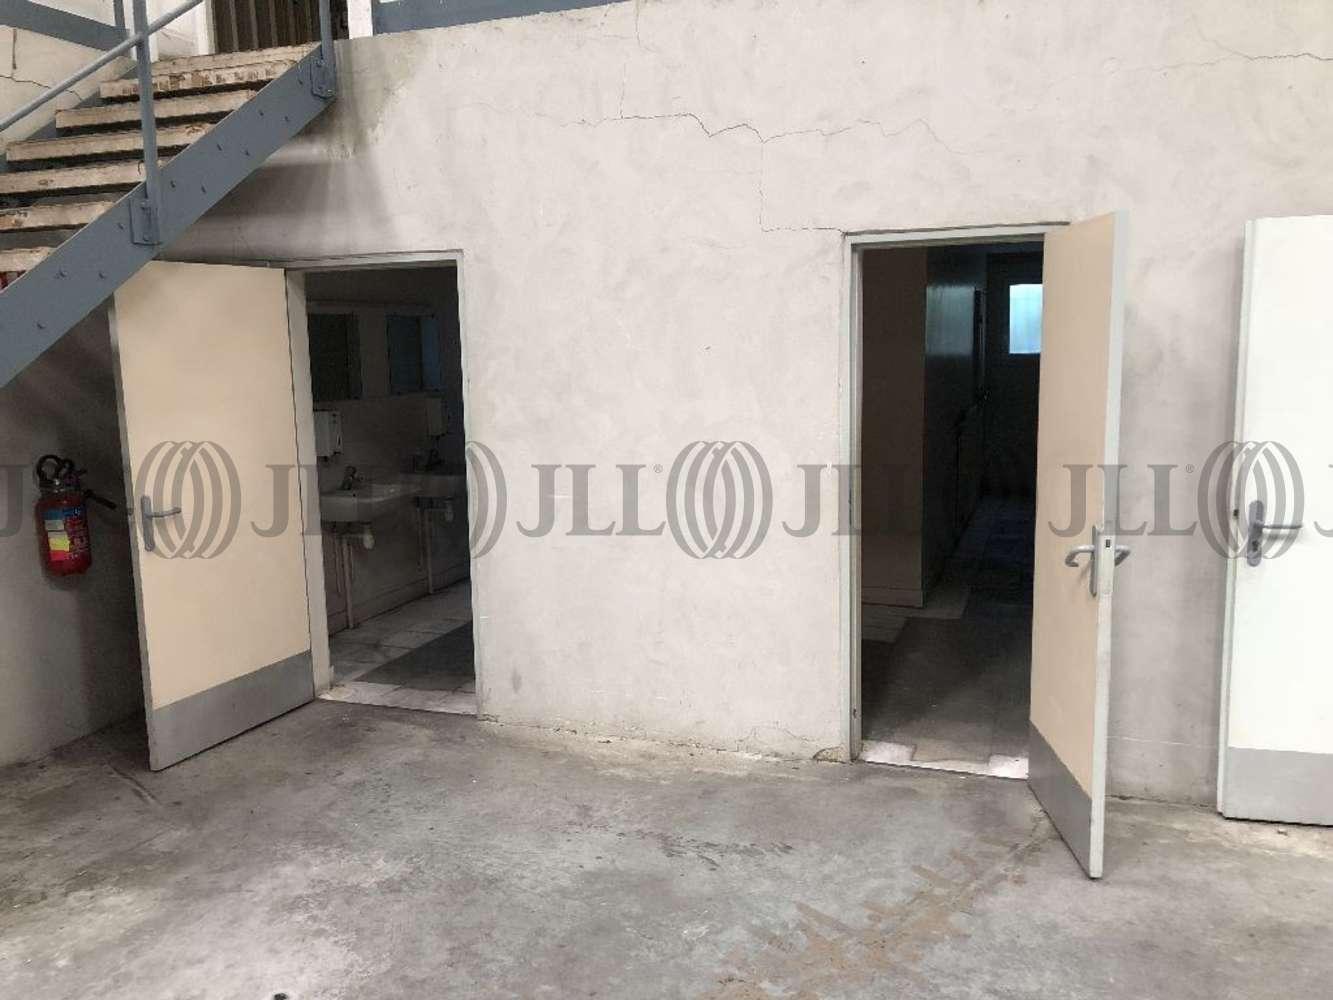 Activités/entrepôt Provins, 77160 - ZAE DE LA GARE - 9617797